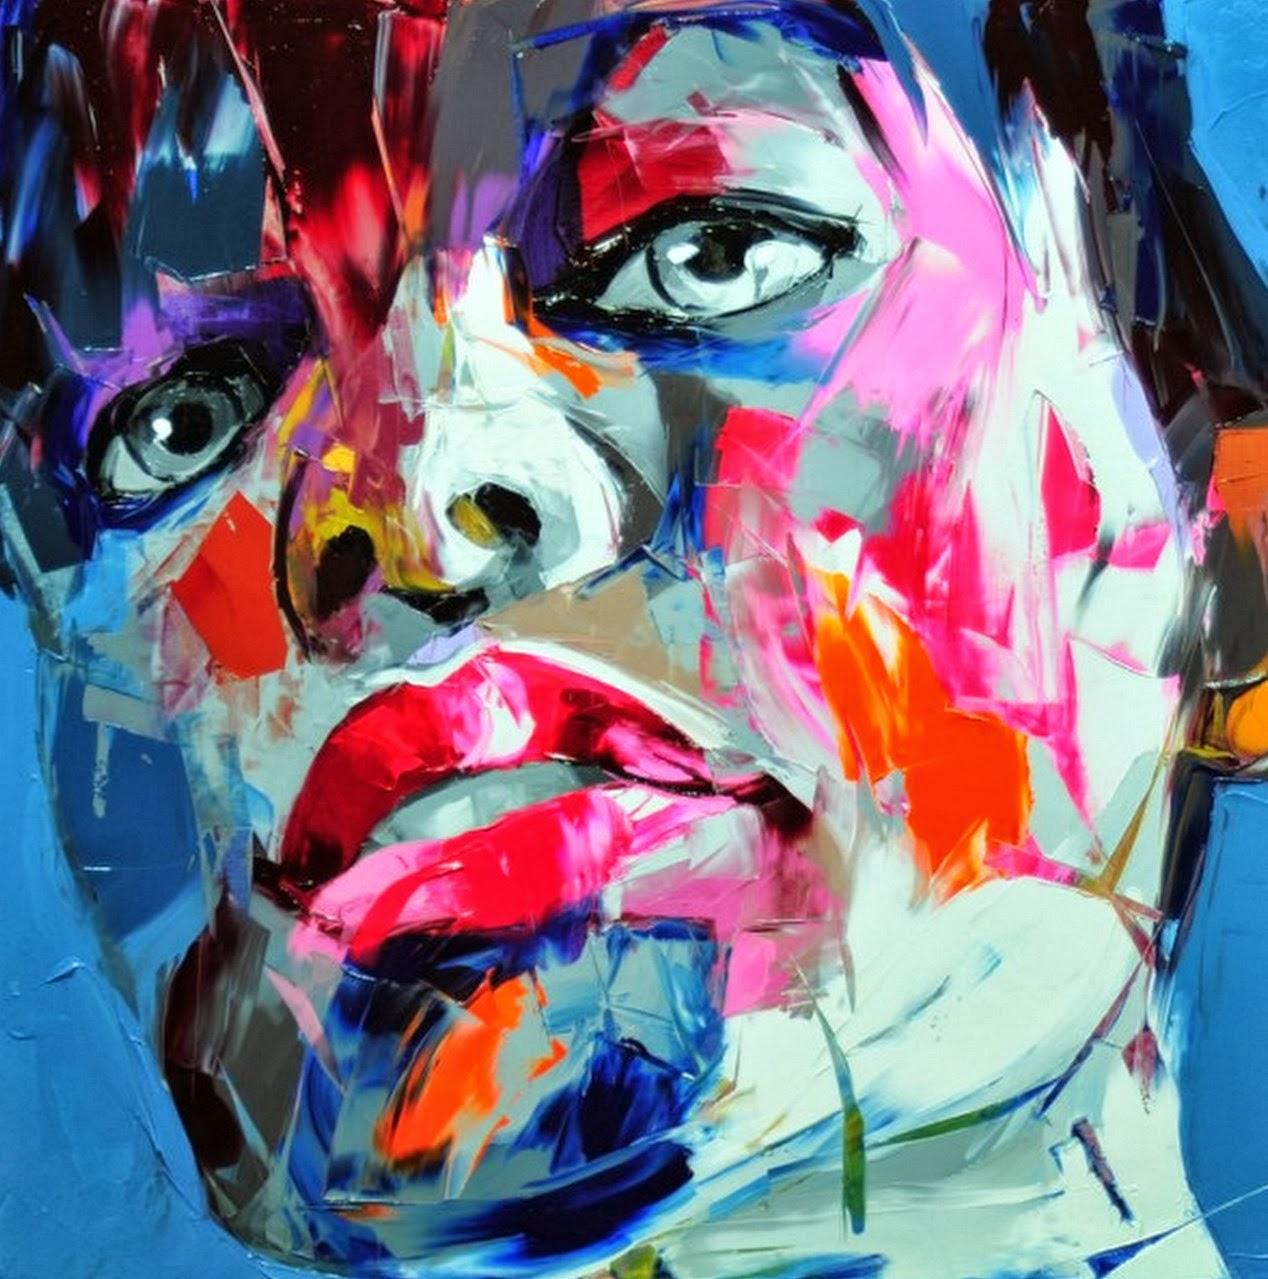 Cuadros modernos pinturas y dibujos pintura de retratos - Cuadros pintura acrilica moderna ...